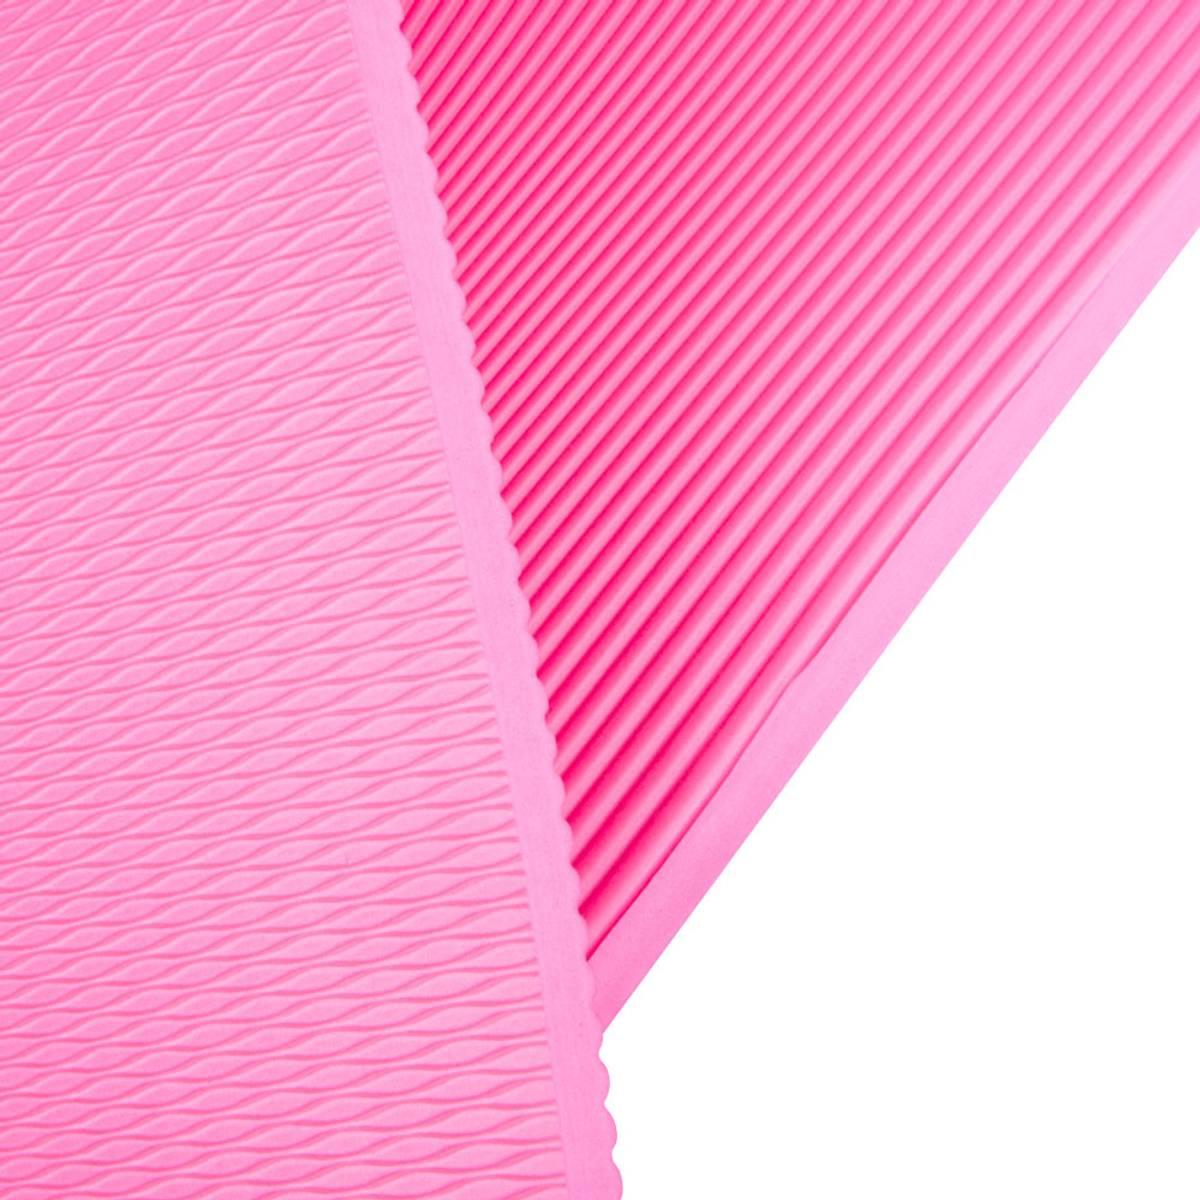 Treningsmatte inSPORTline Profi 100 cm - Rosa (rød)